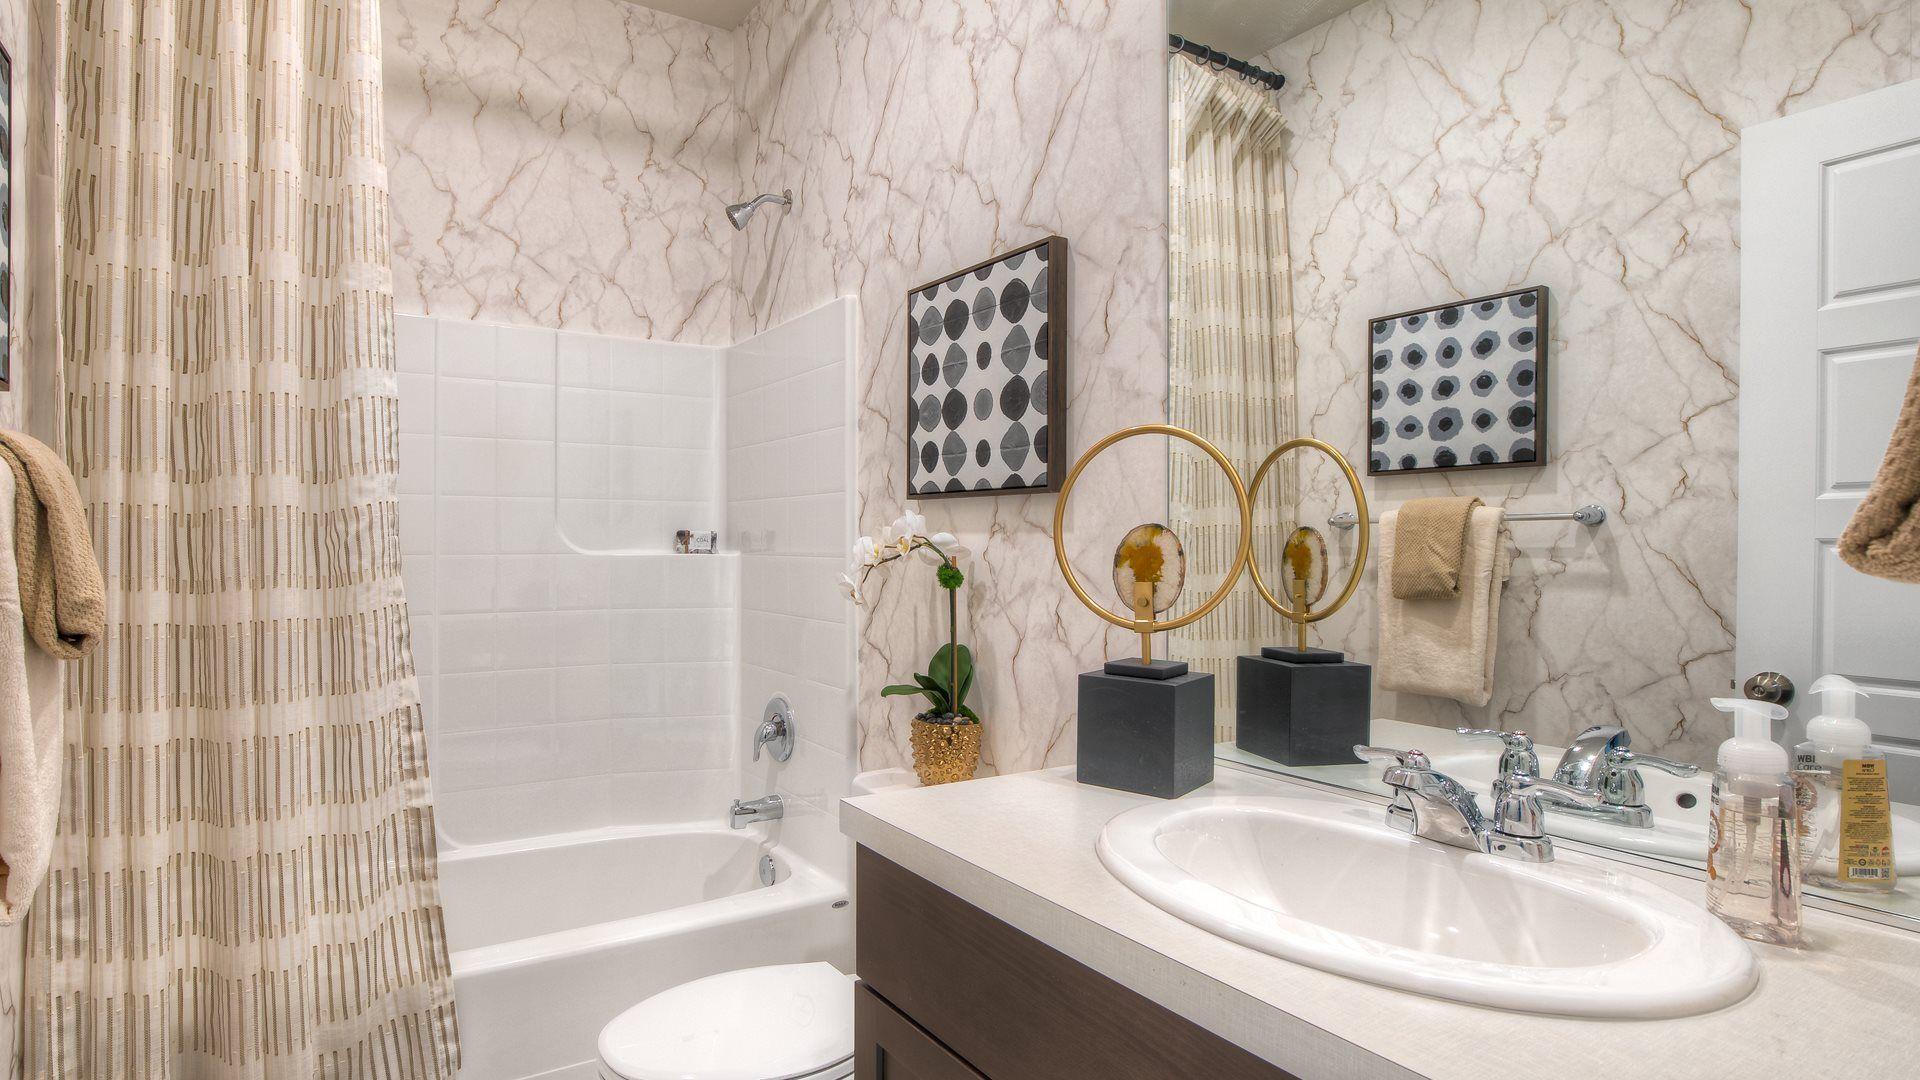 Bathroom featured in the Hamilton By Lennar in Olympia, WA